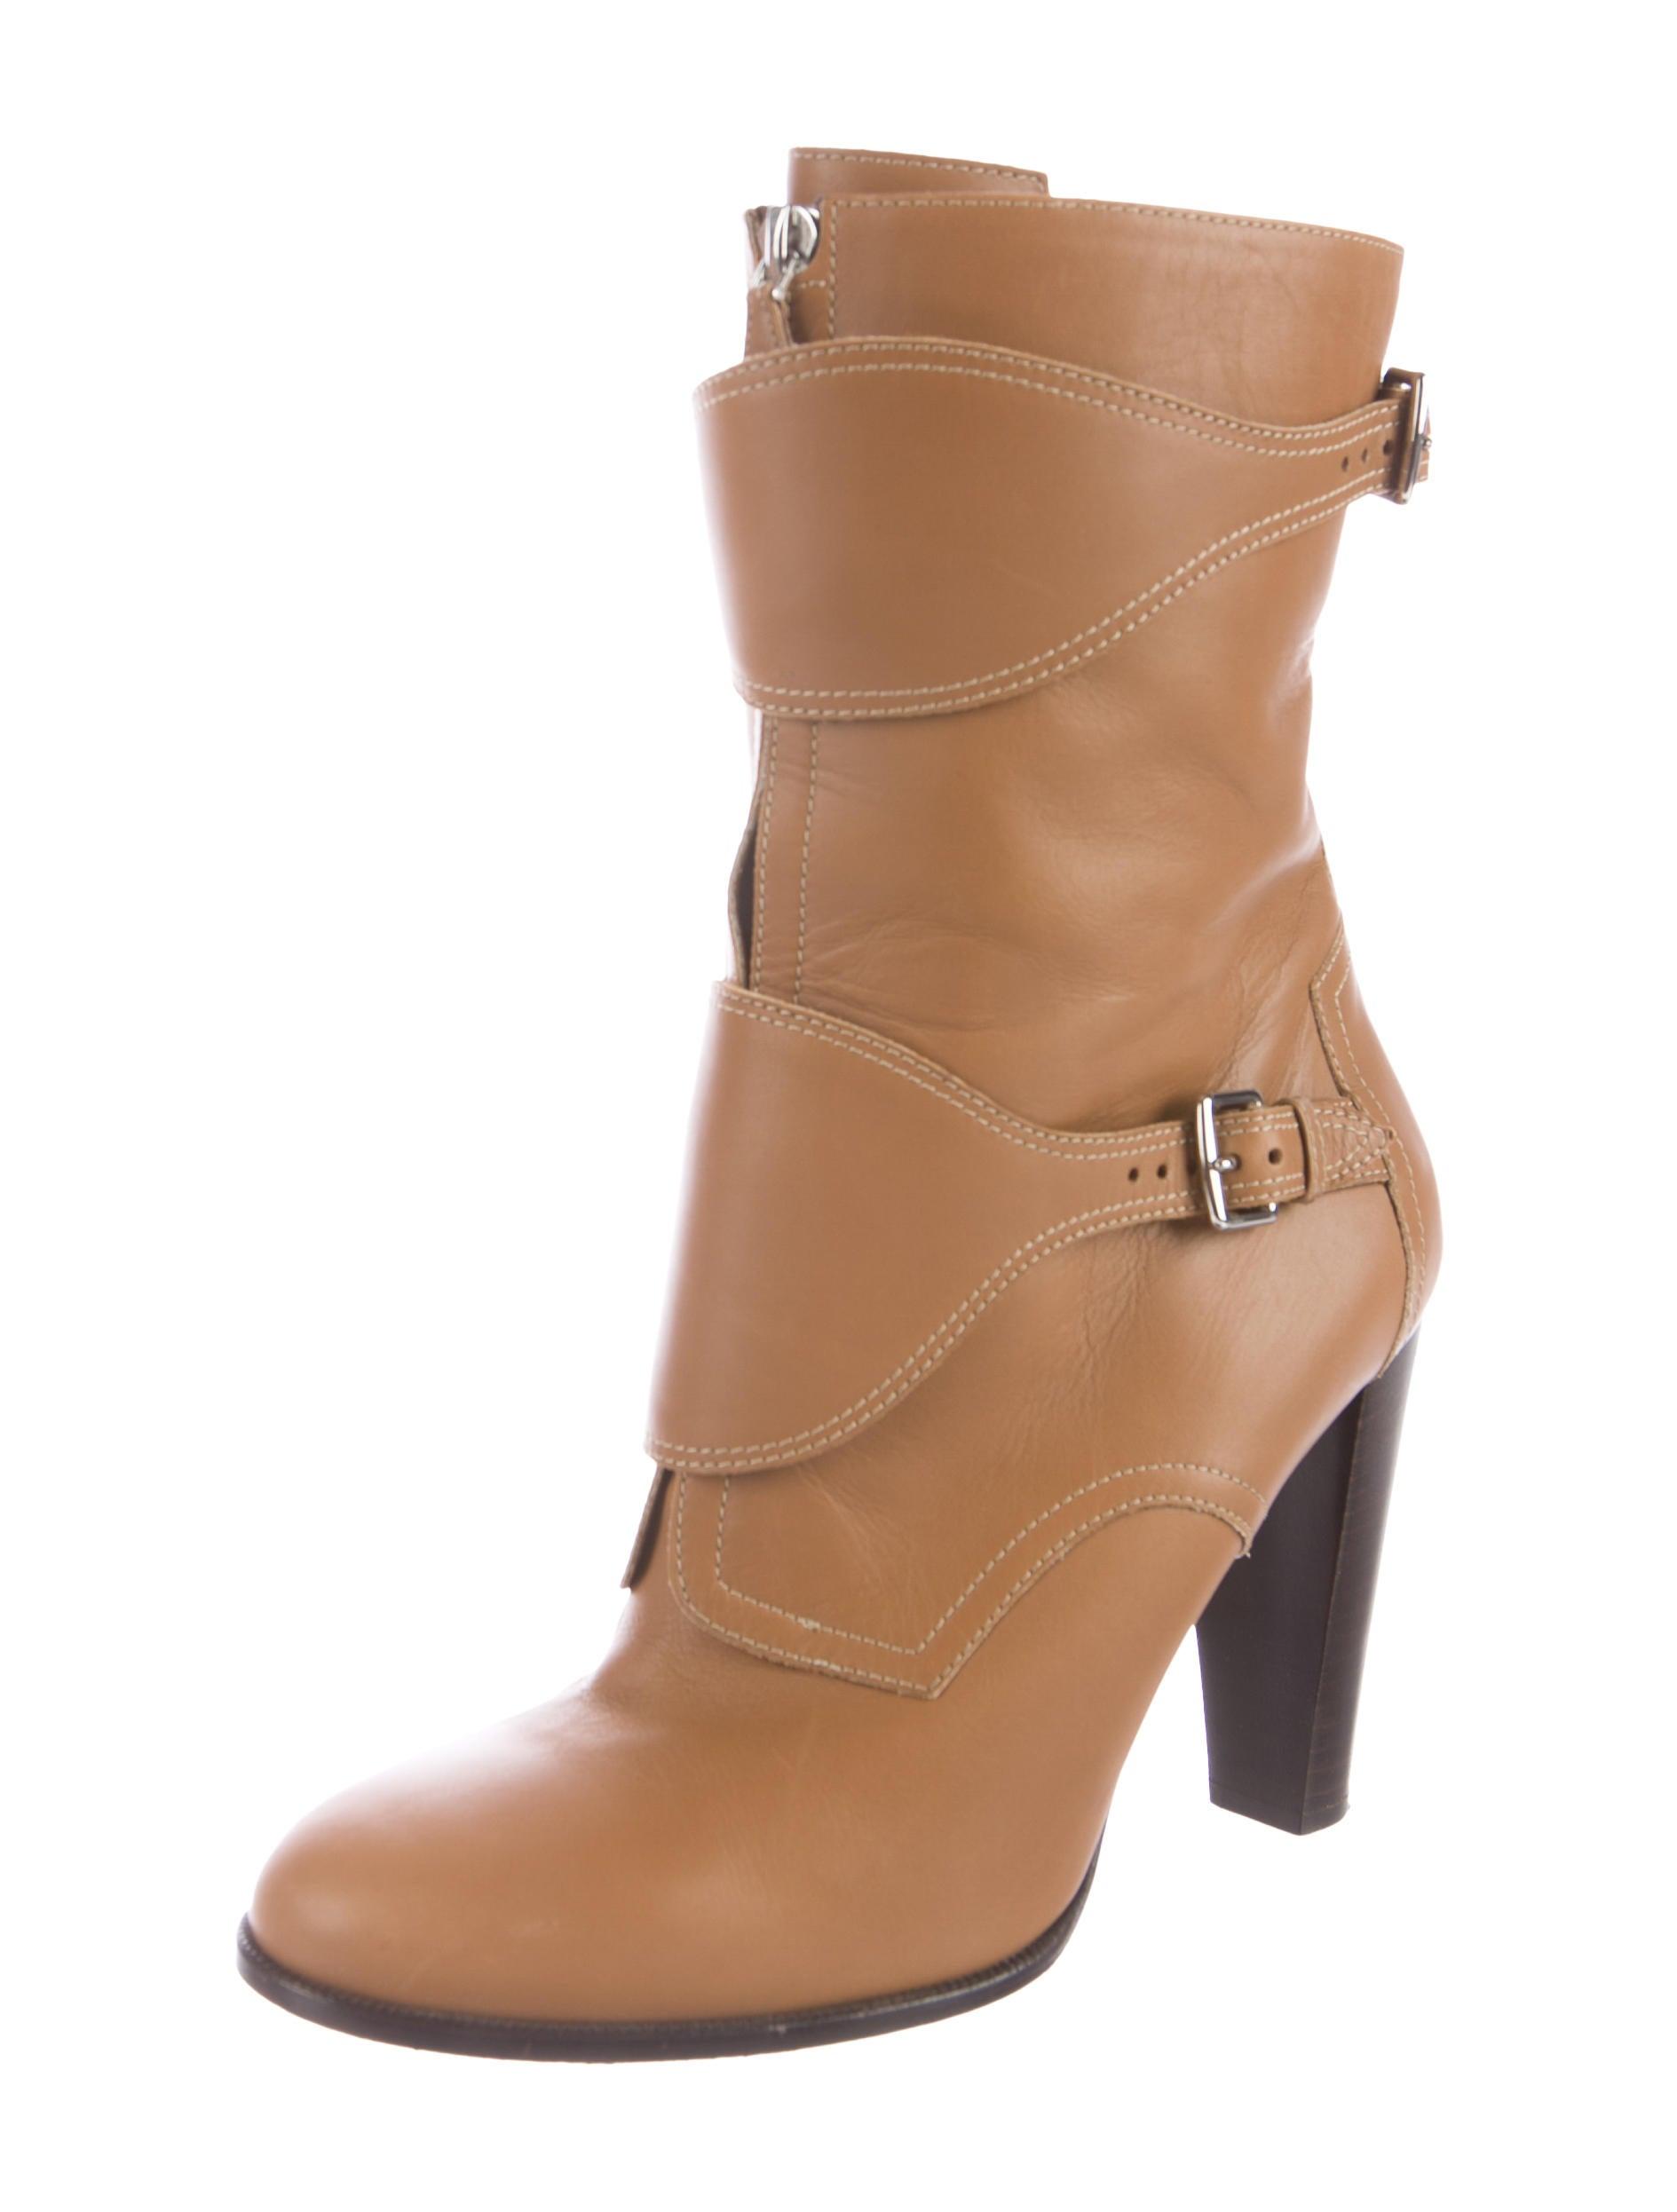 hermes women shoes - photo #36